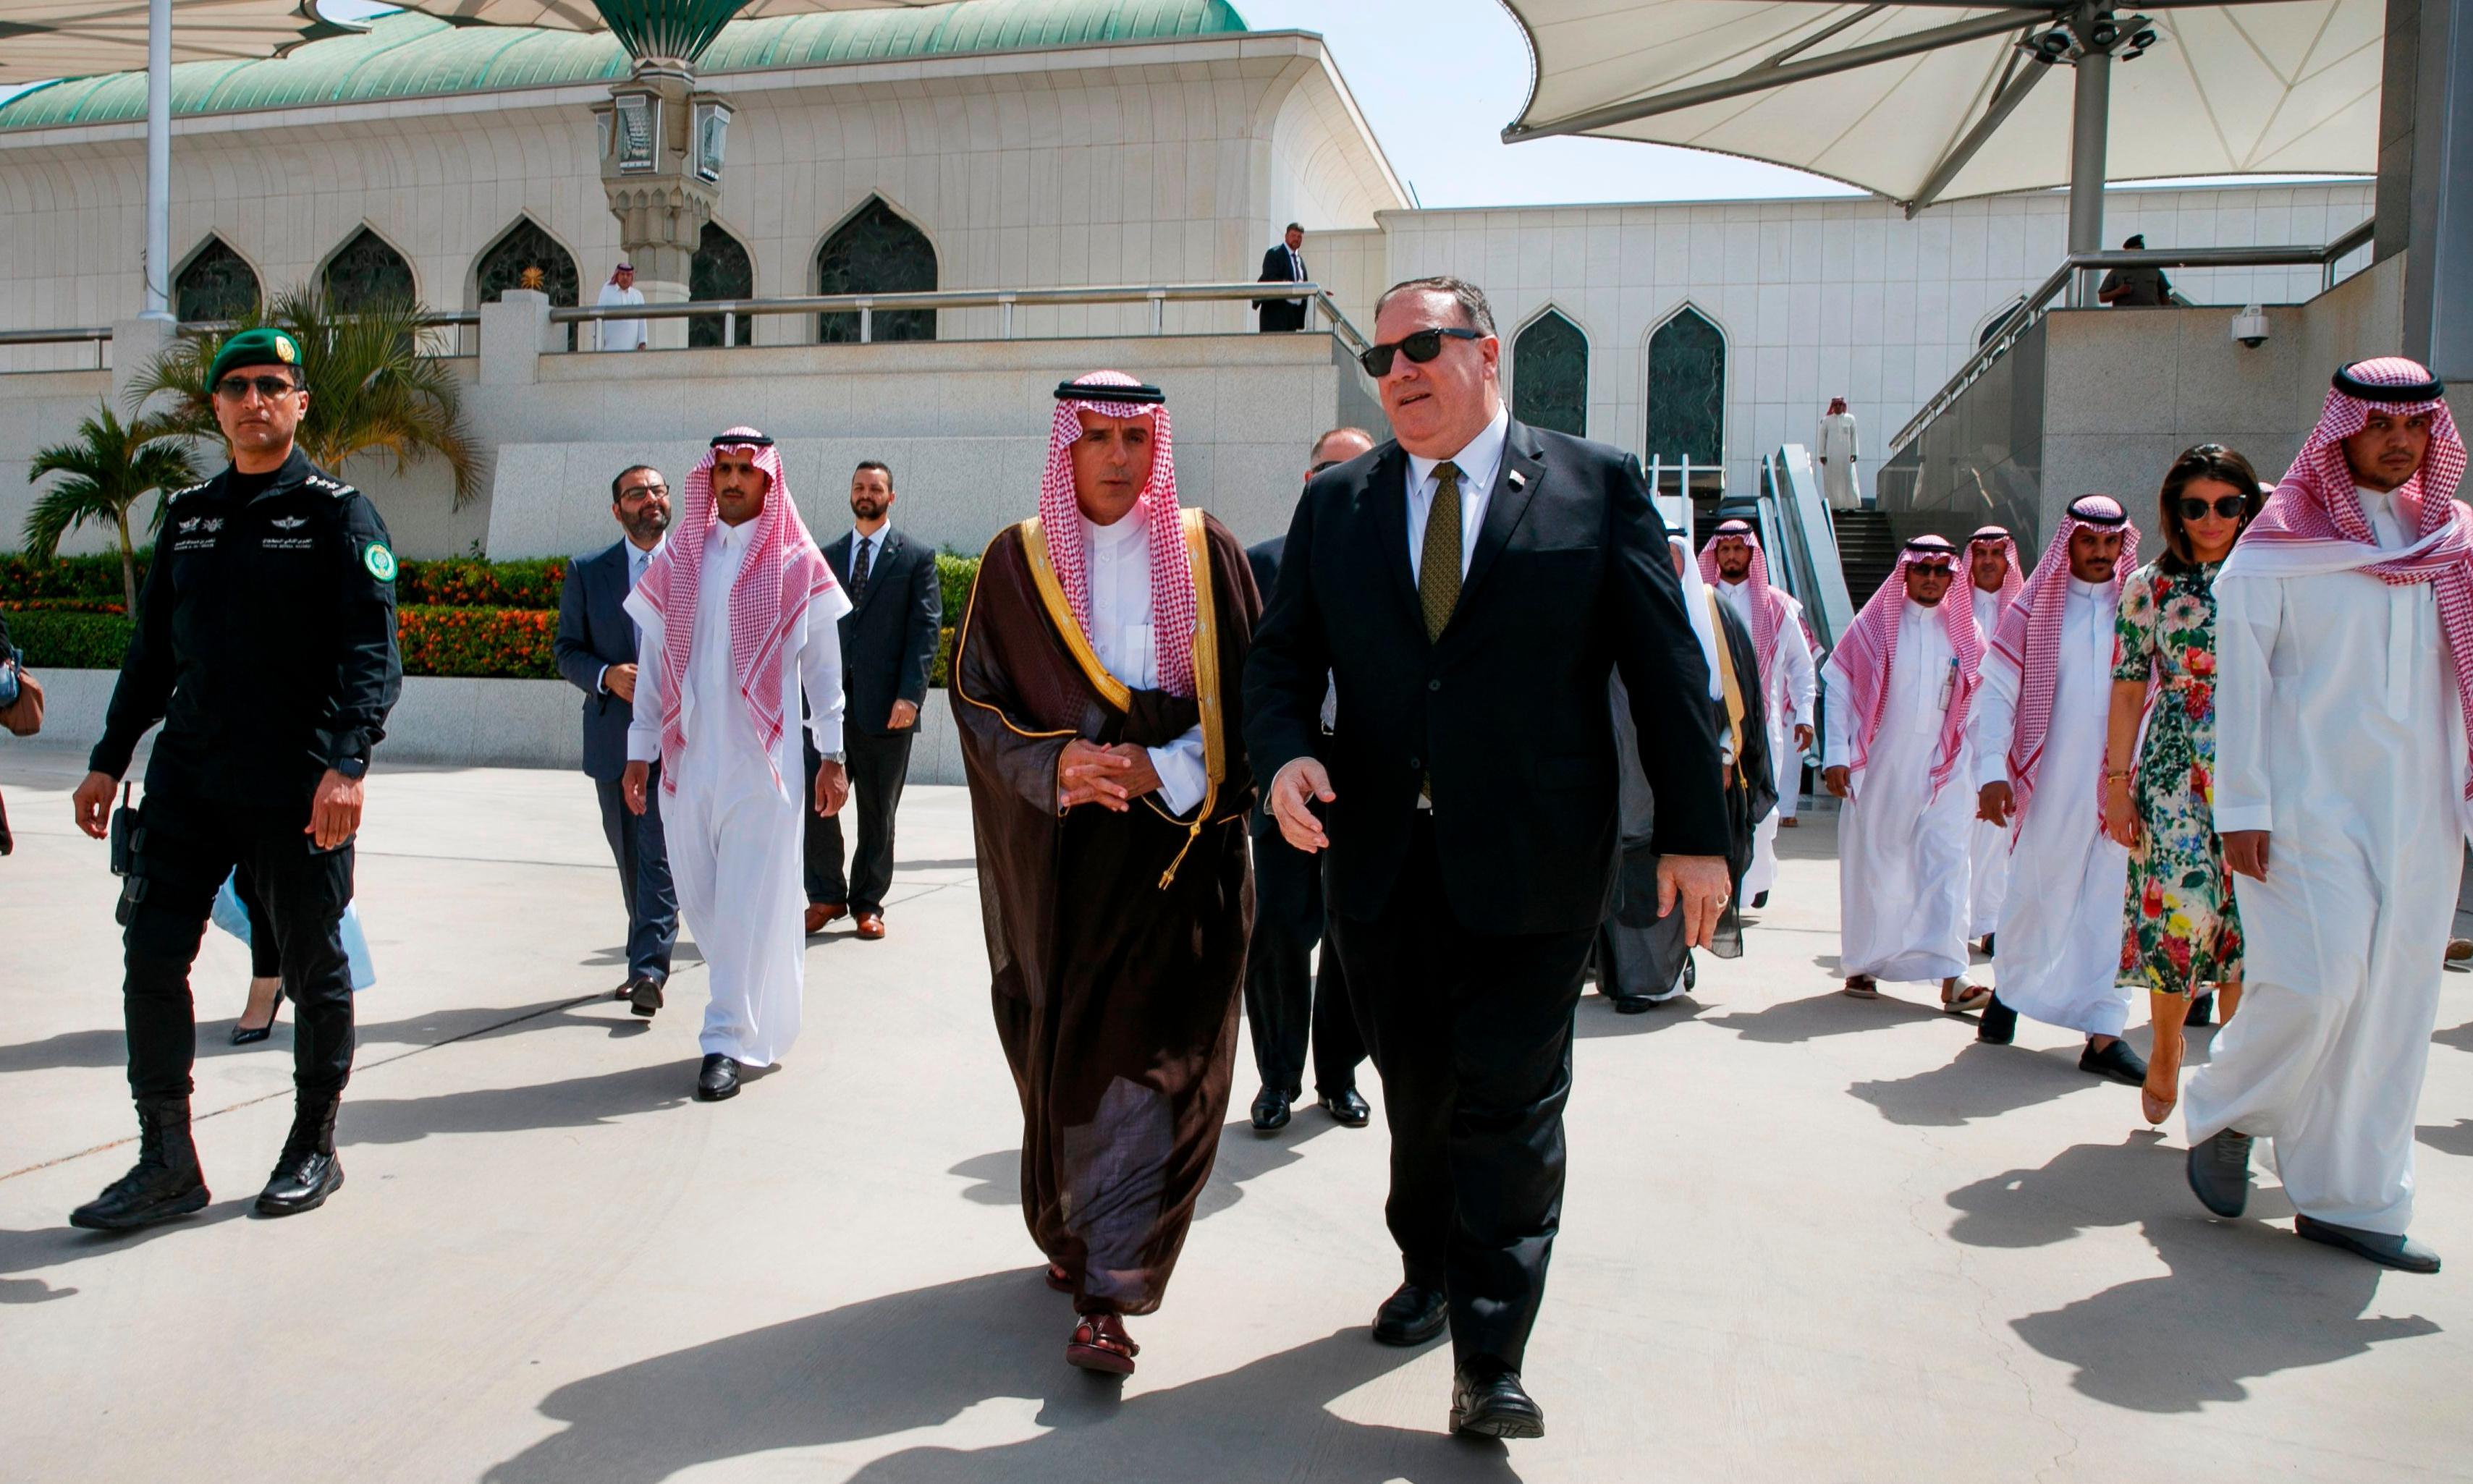 Mike Pompeo didn't raise Jamal Khashoggi murder in meeting with Saudi king